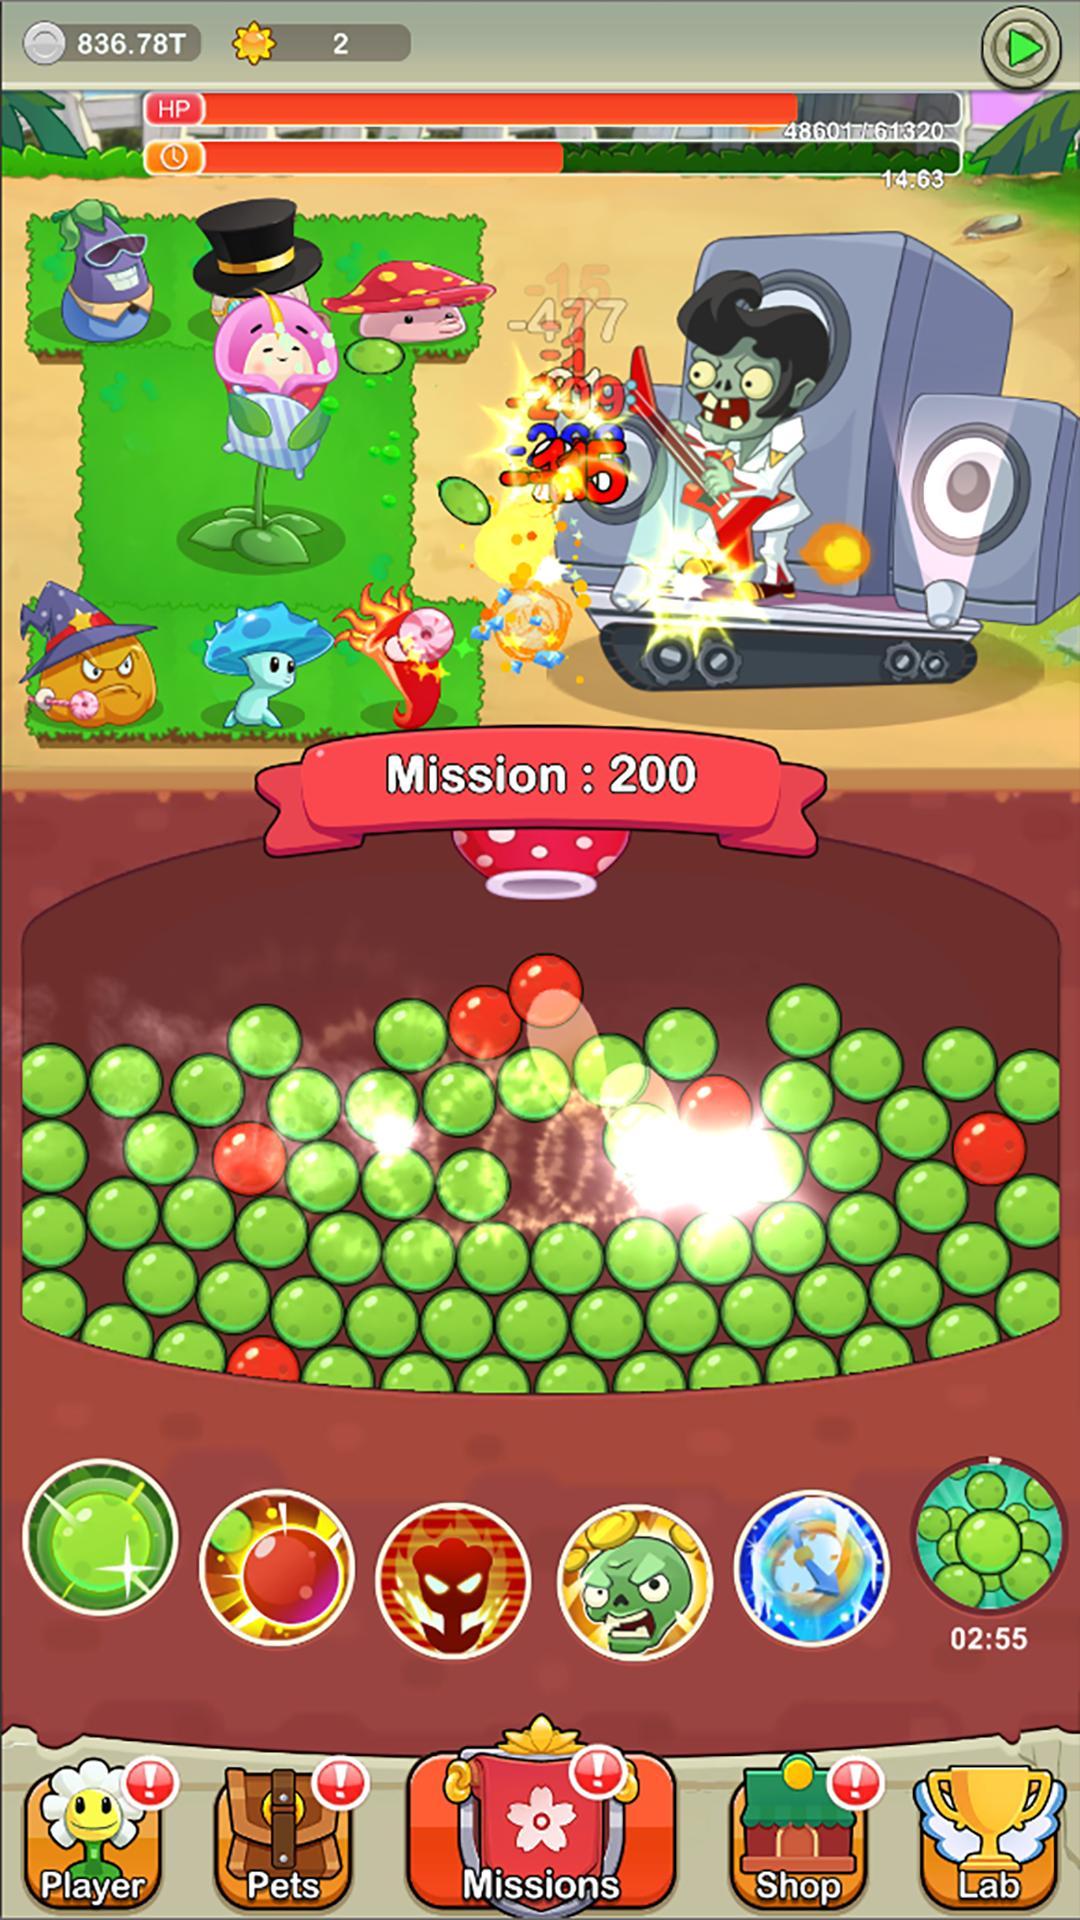 Save Garden Zombie Attack & Idle RPG 1.3.5 Screenshot 2